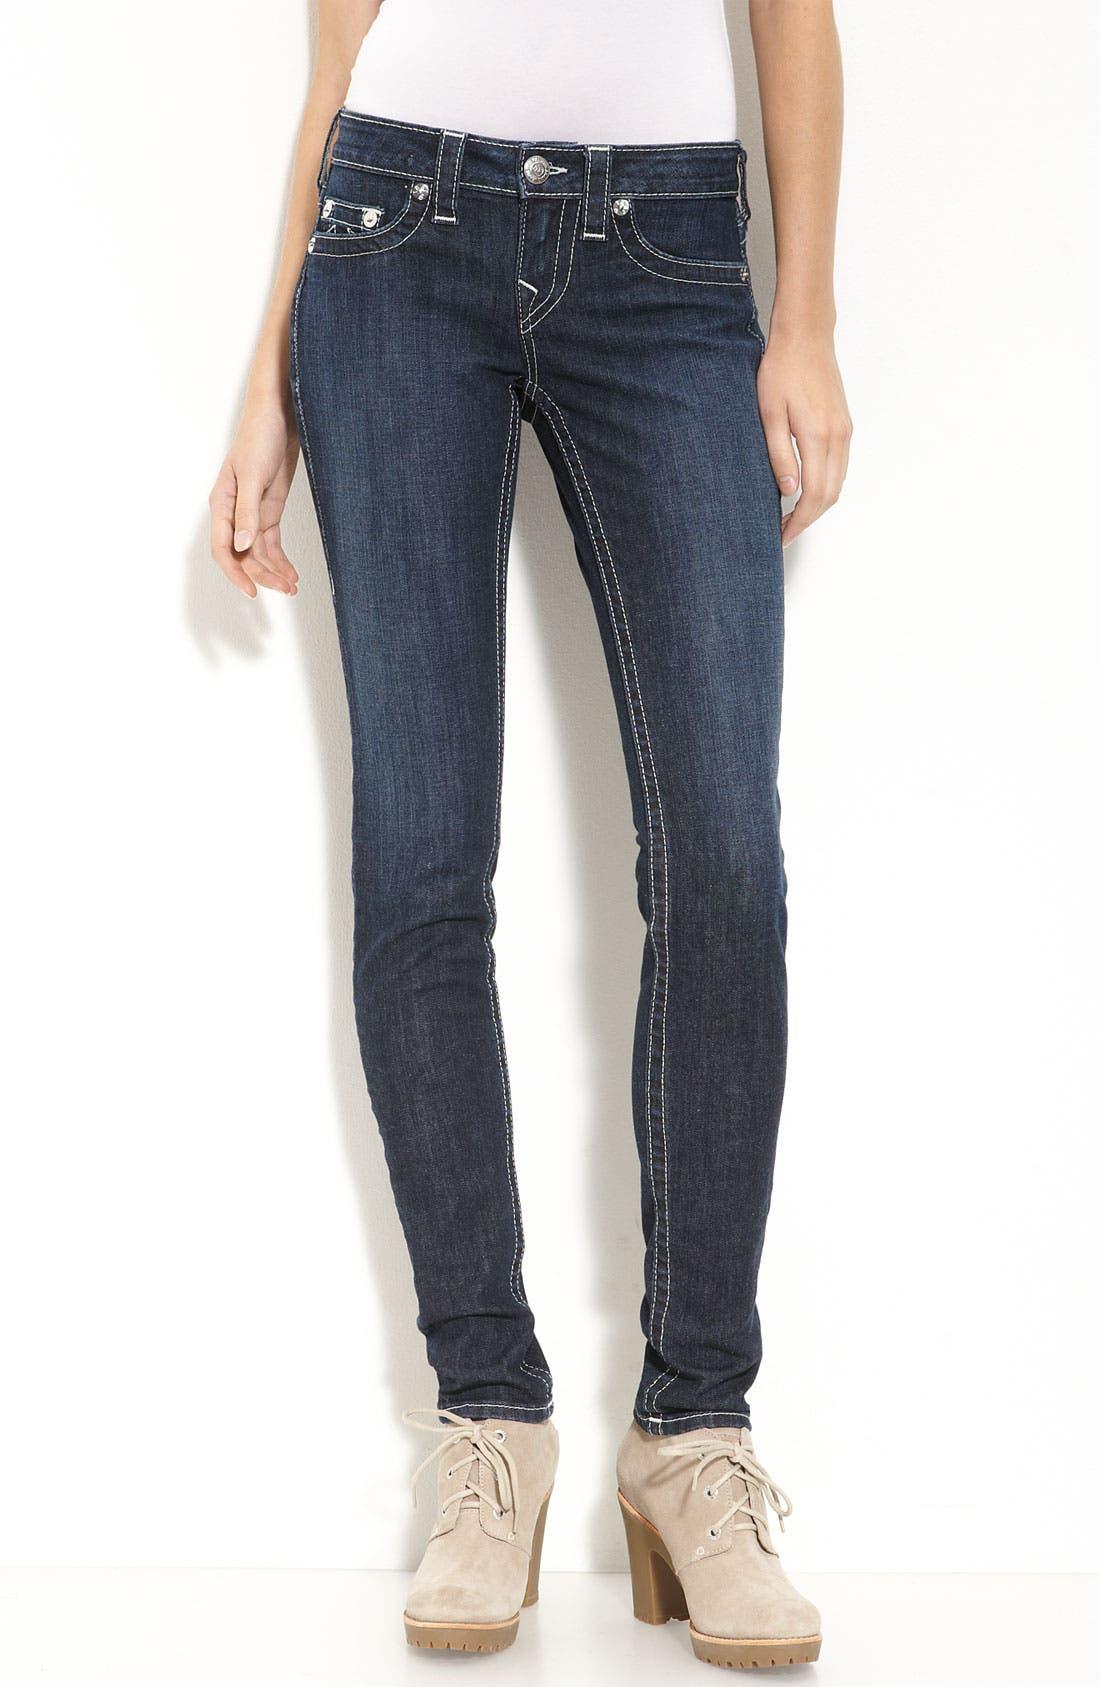 Main Image - True Religion Brand Jeans Skinny Jeans (Lonestar Wash)